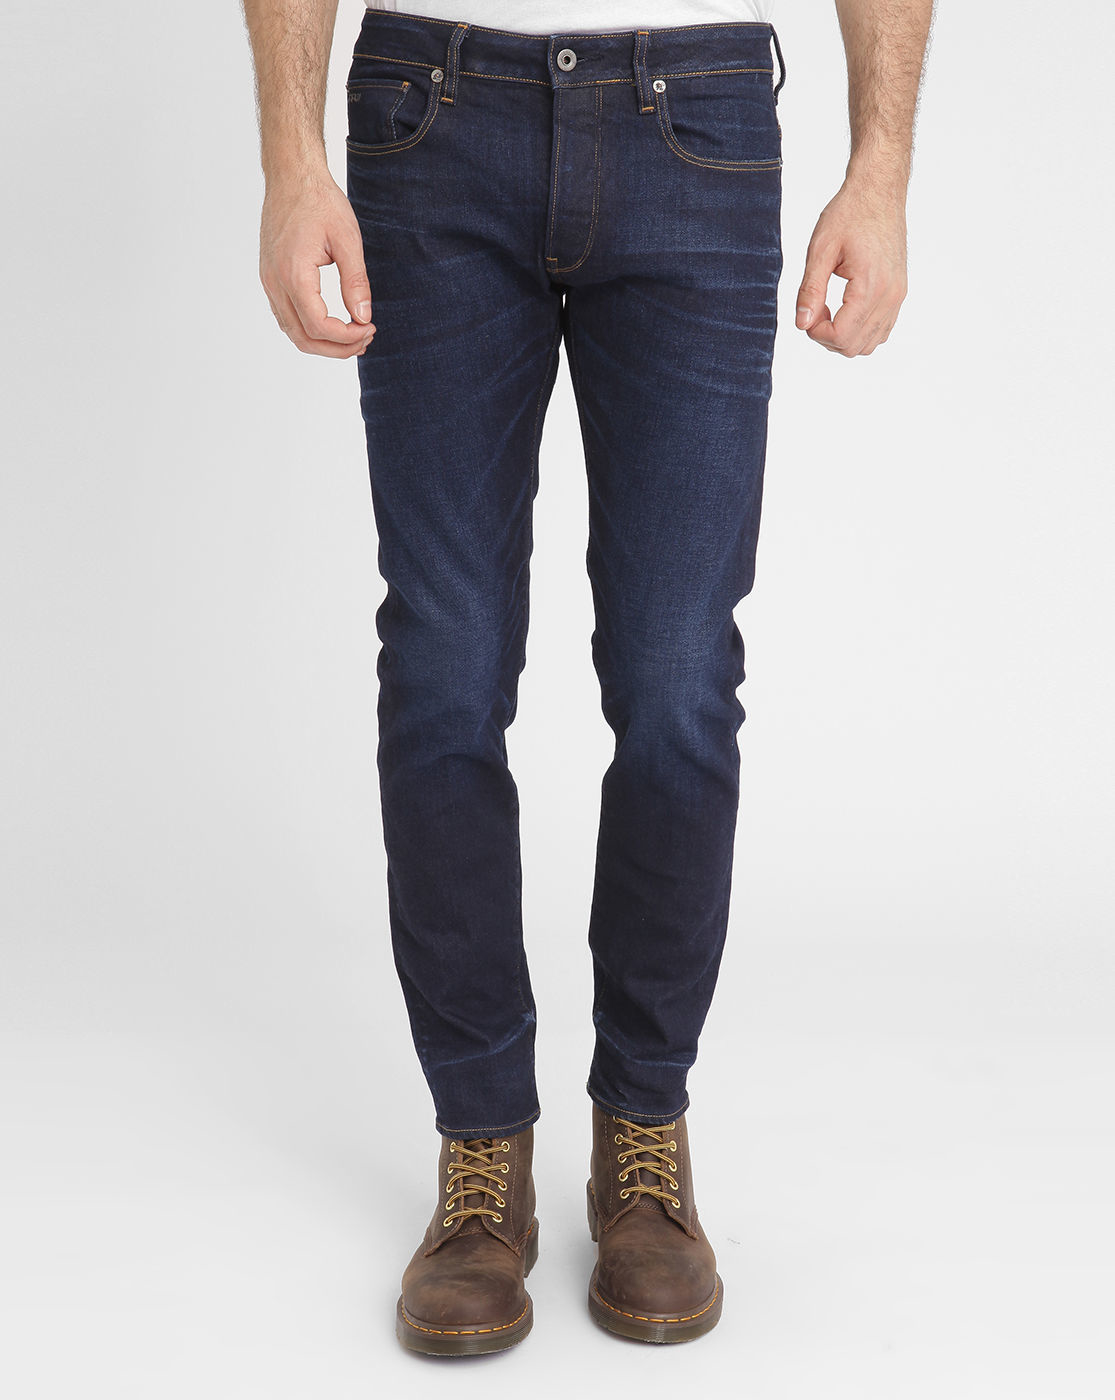 g star raw faded blue 3301 slim fit jeans in blue for men. Black Bedroom Furniture Sets. Home Design Ideas